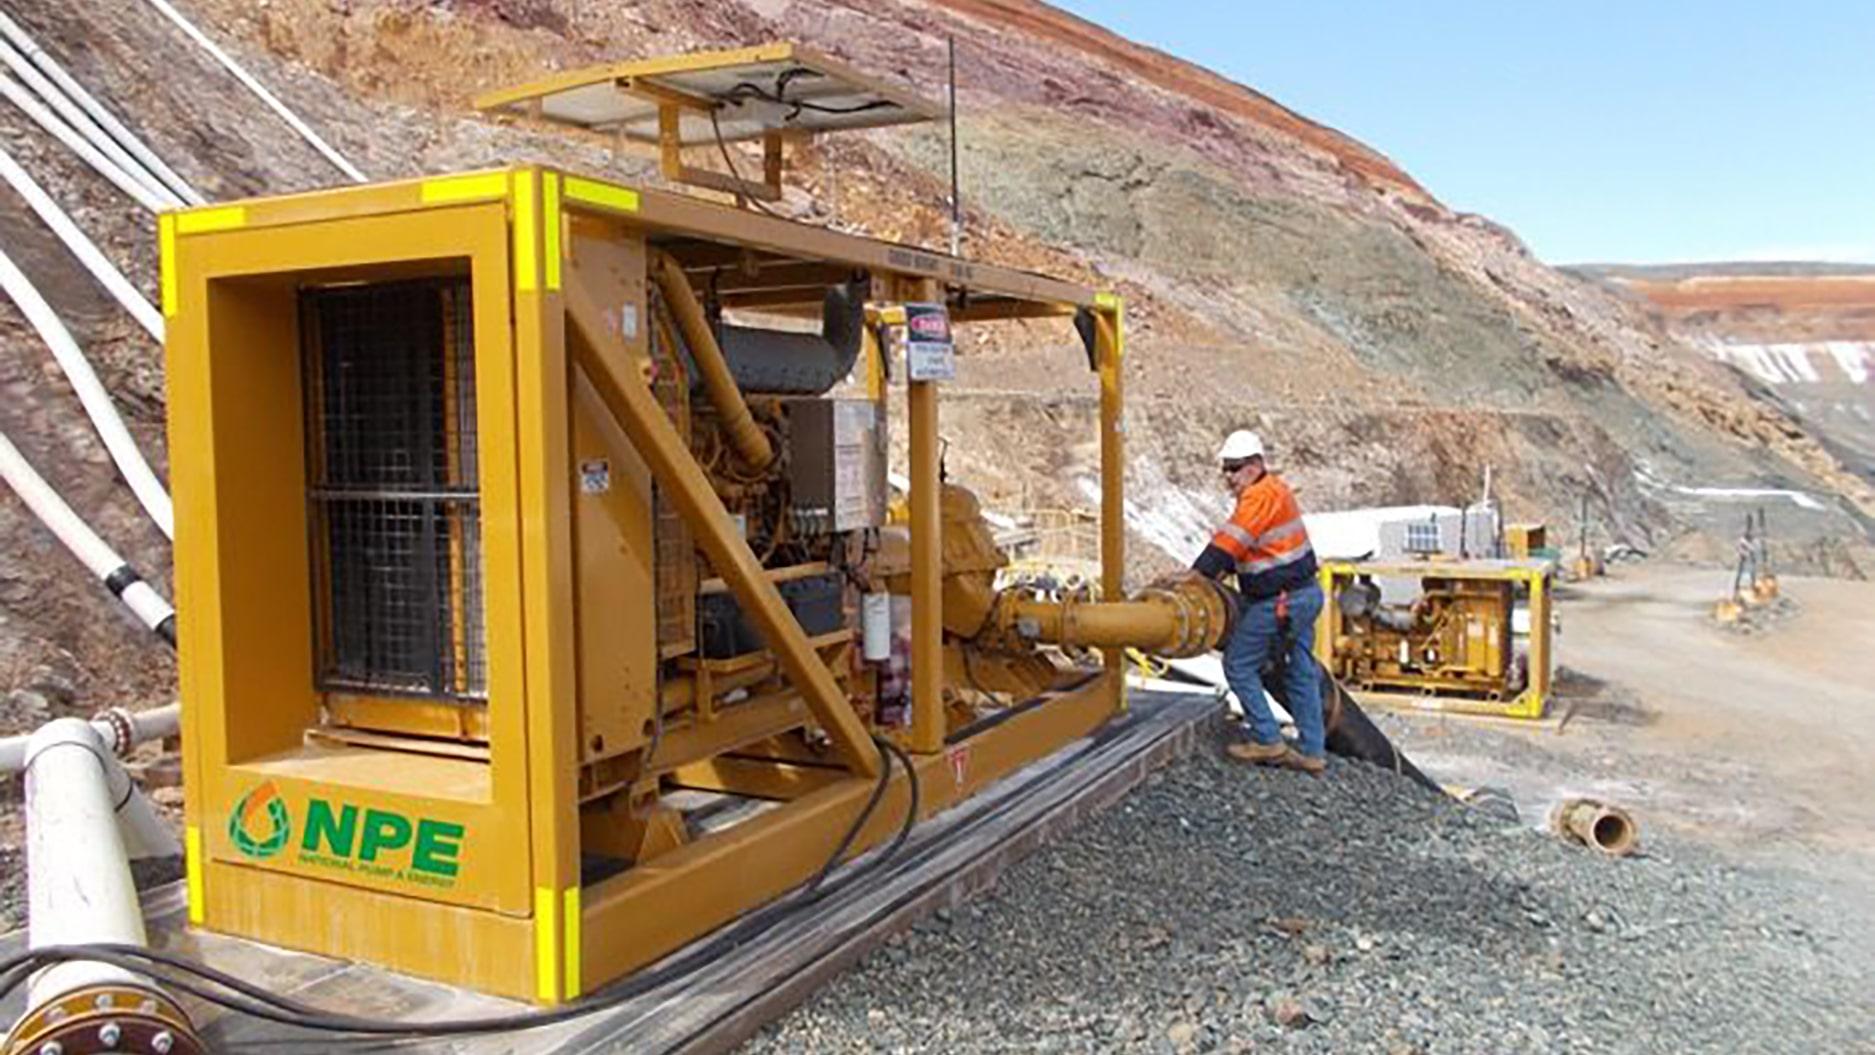 NPE-monitoring-machine-on-job-site